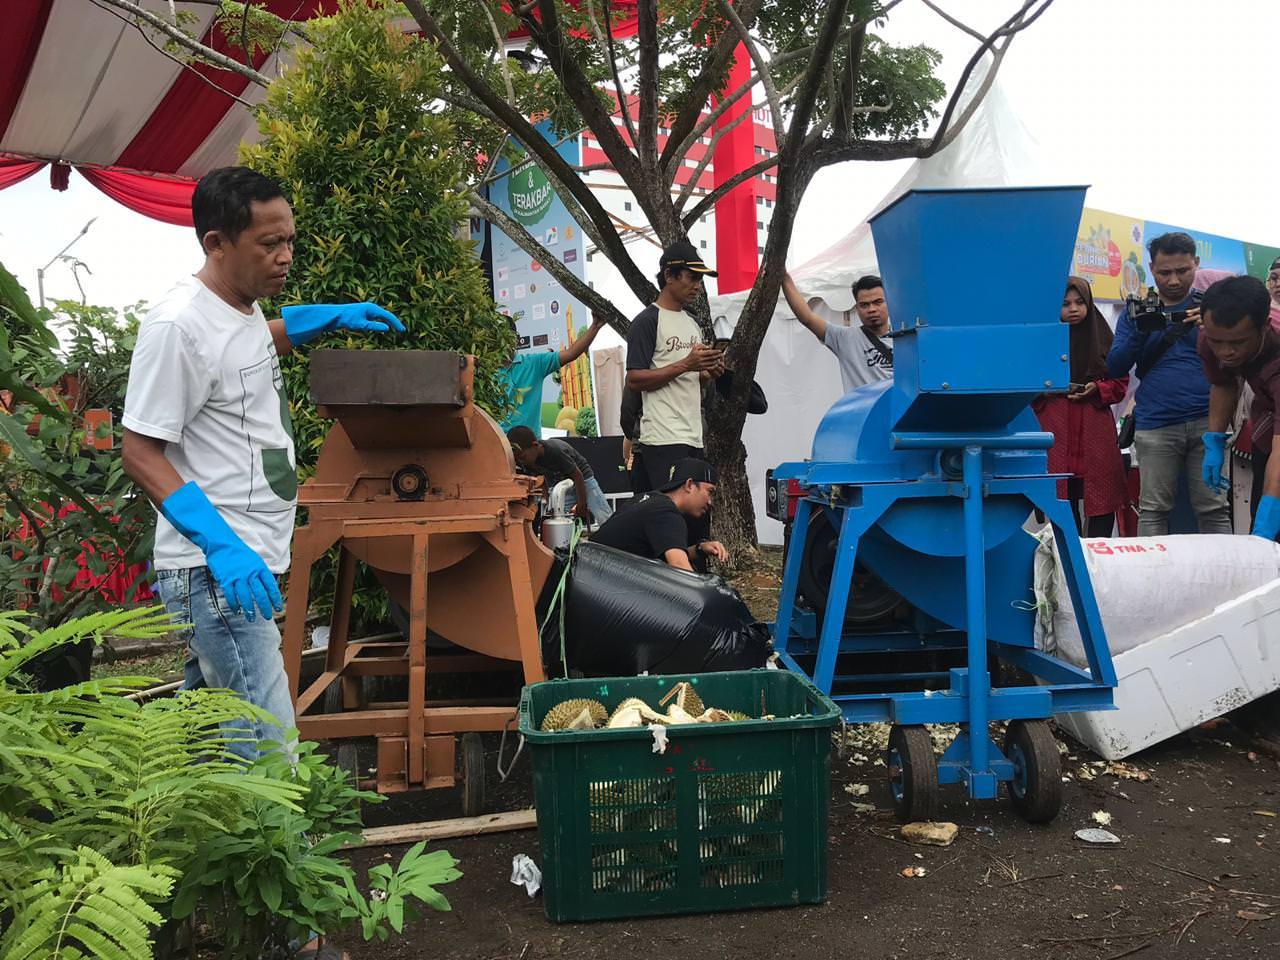 Rumah Pupuk Organik Ubah Kulit Durian jadi Pupuk